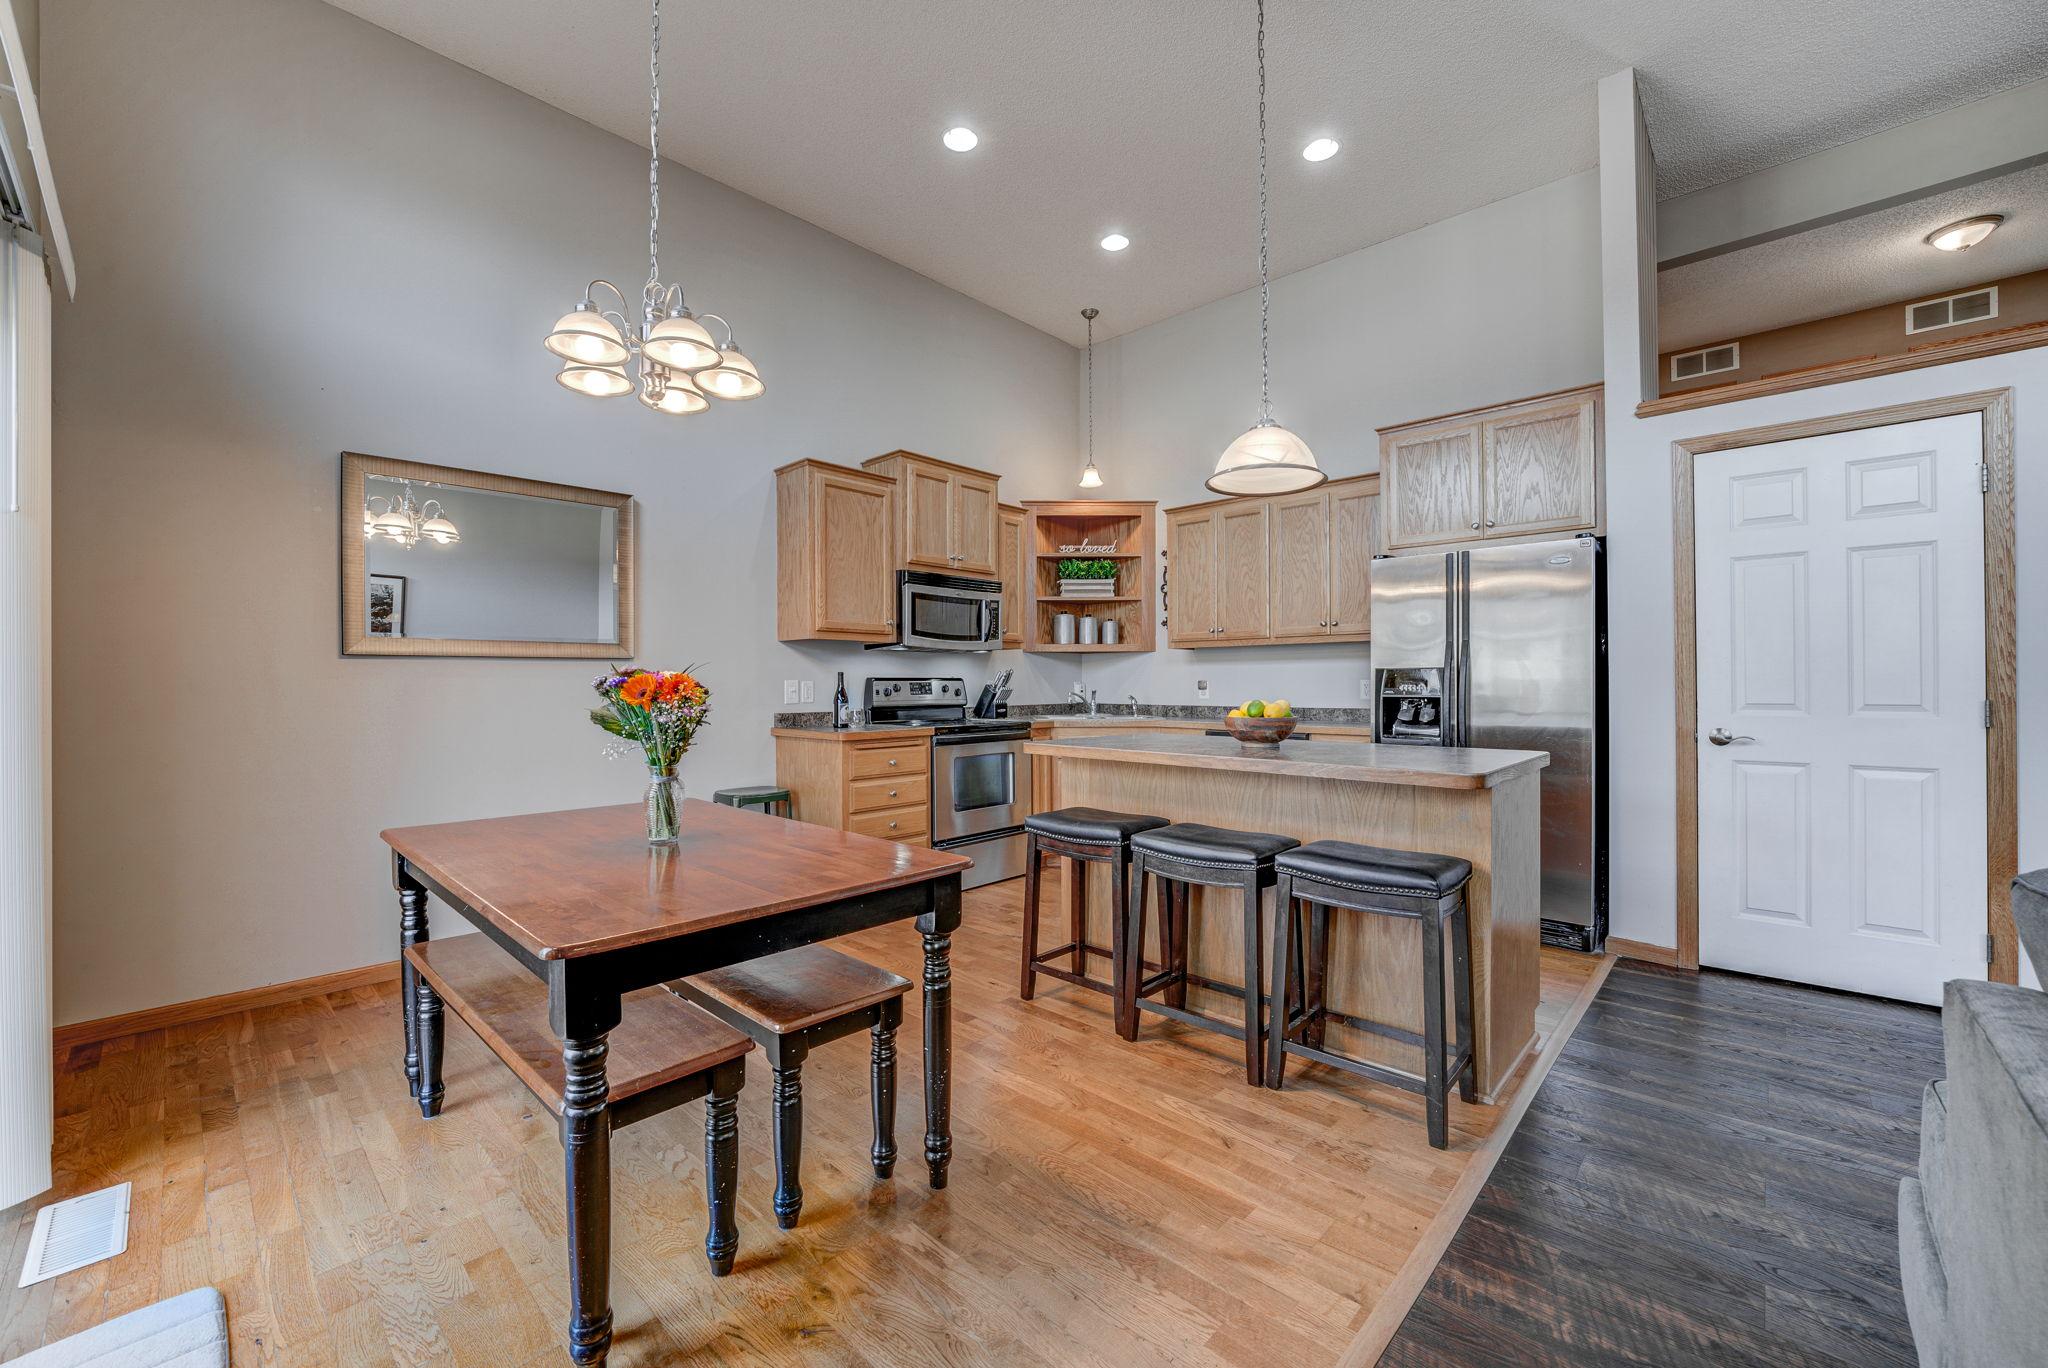 Kitchen/Eating Area